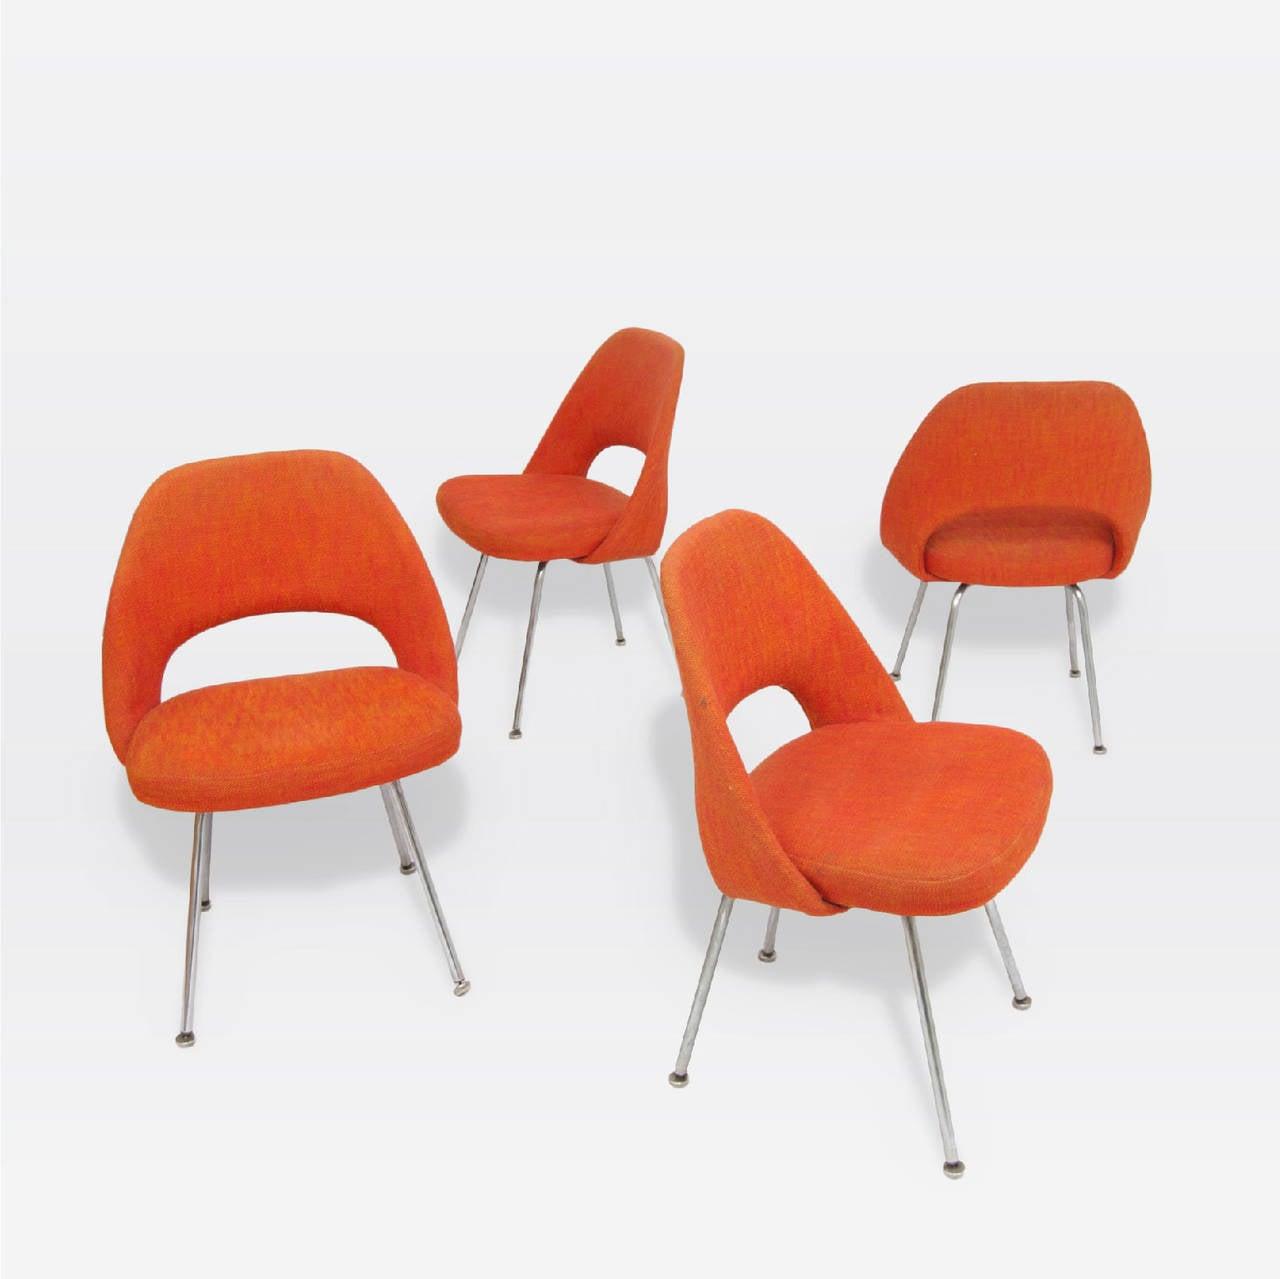 20 set of four early eero saarinen chairs at 1stdibs 6 blac